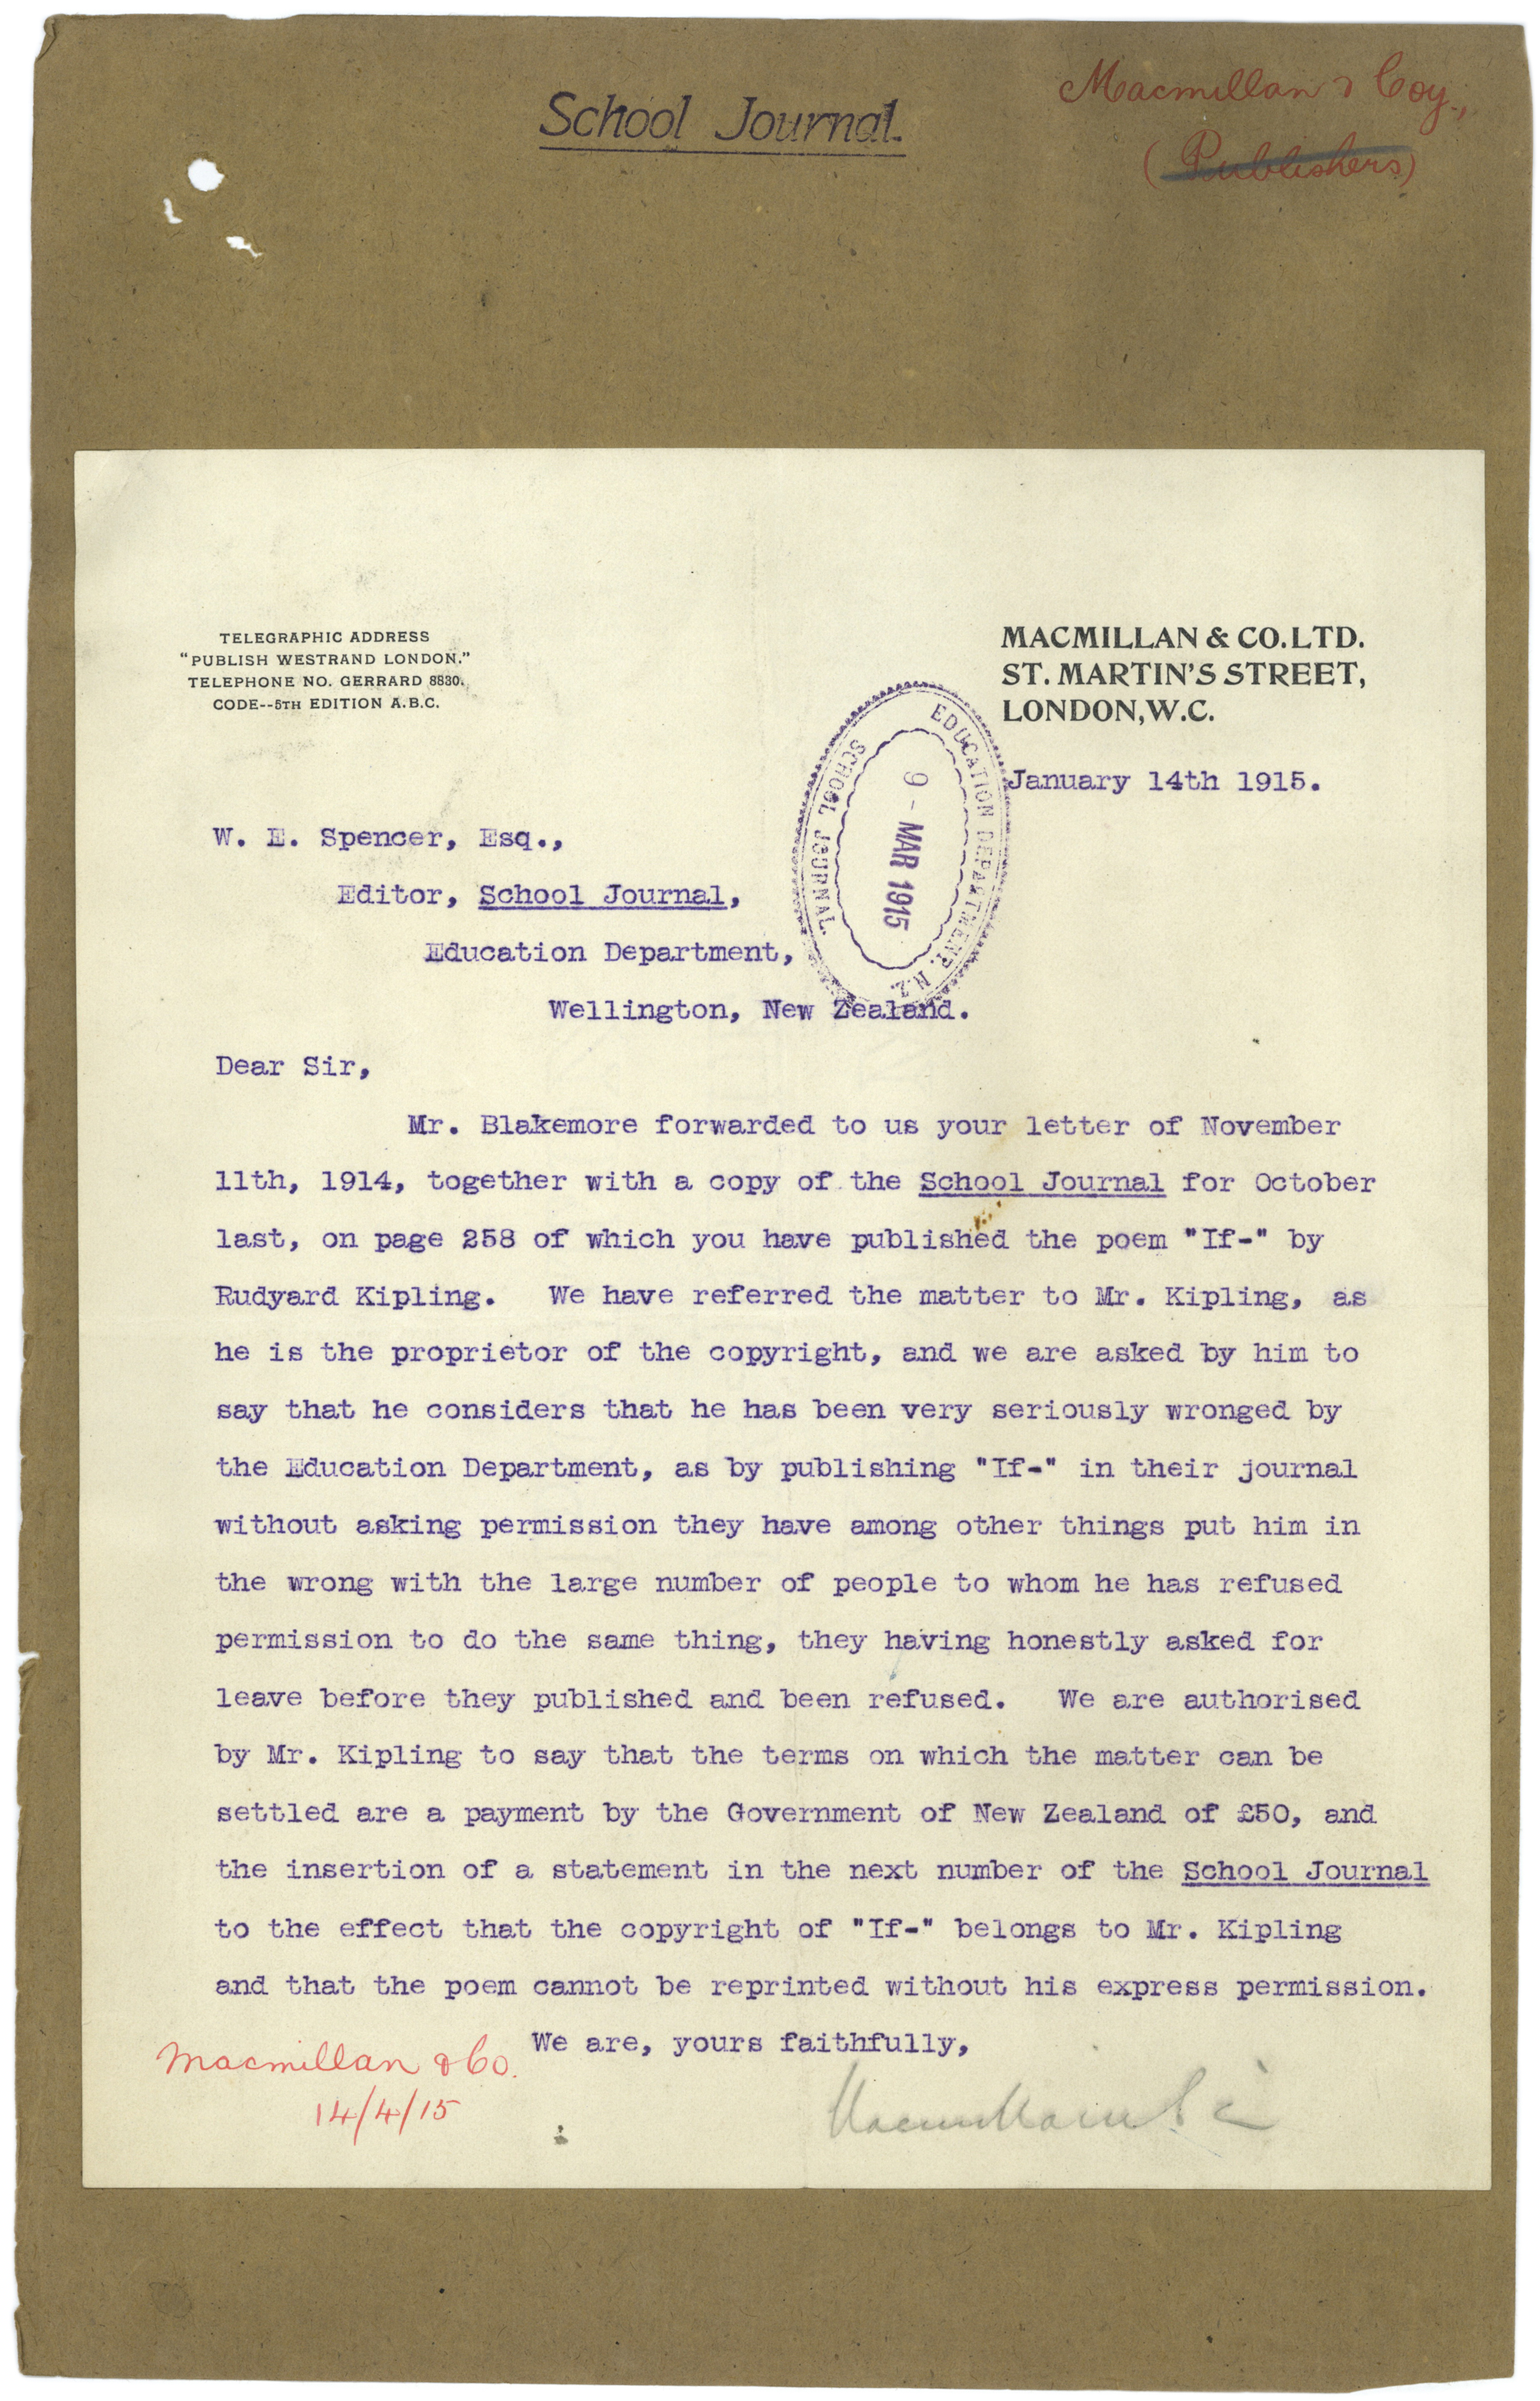 Fileletter Regarding The Publication Of Rudyard Kiplings